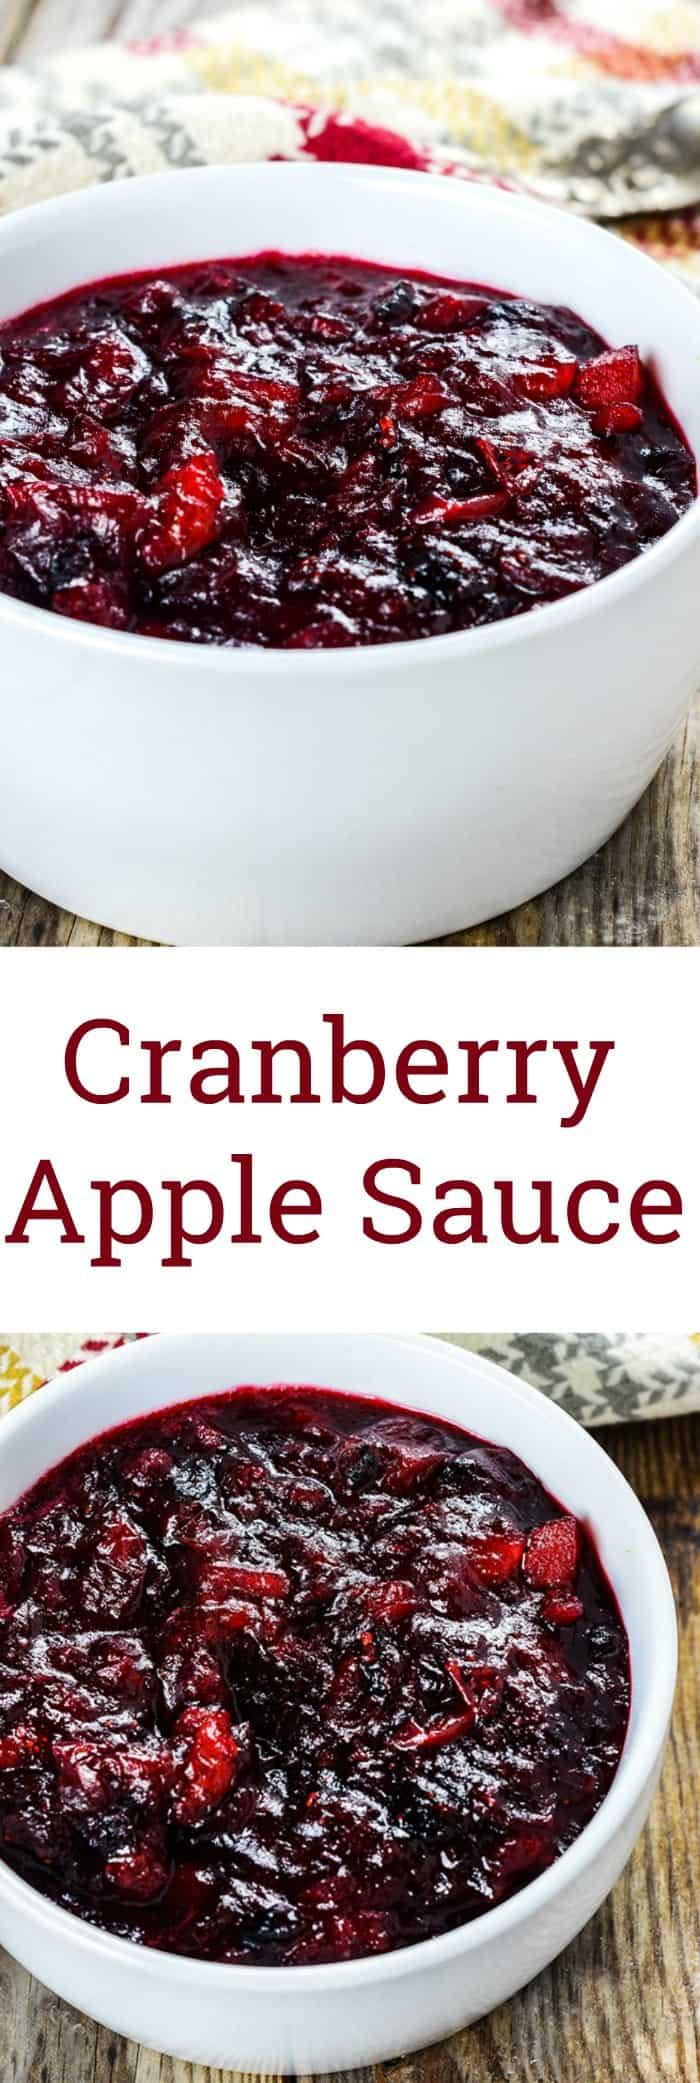 Healthy Cranberry Applesauce